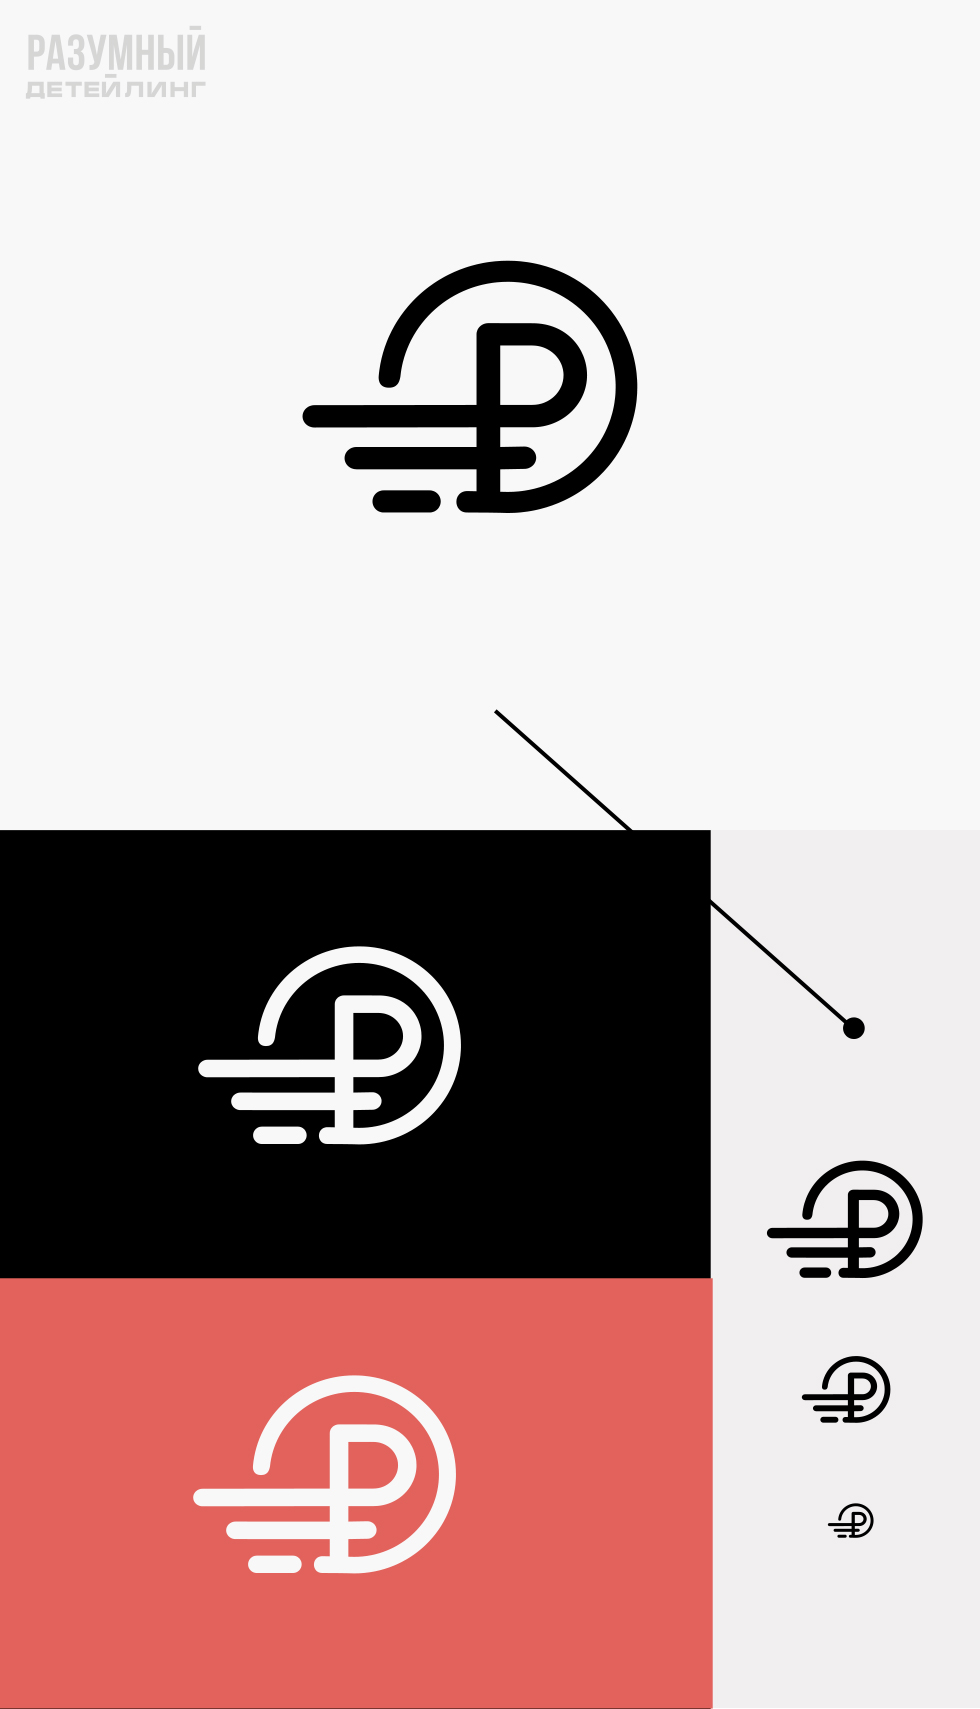 Ребрендинг логотипа  фото f_4965ad75745803b8.jpg